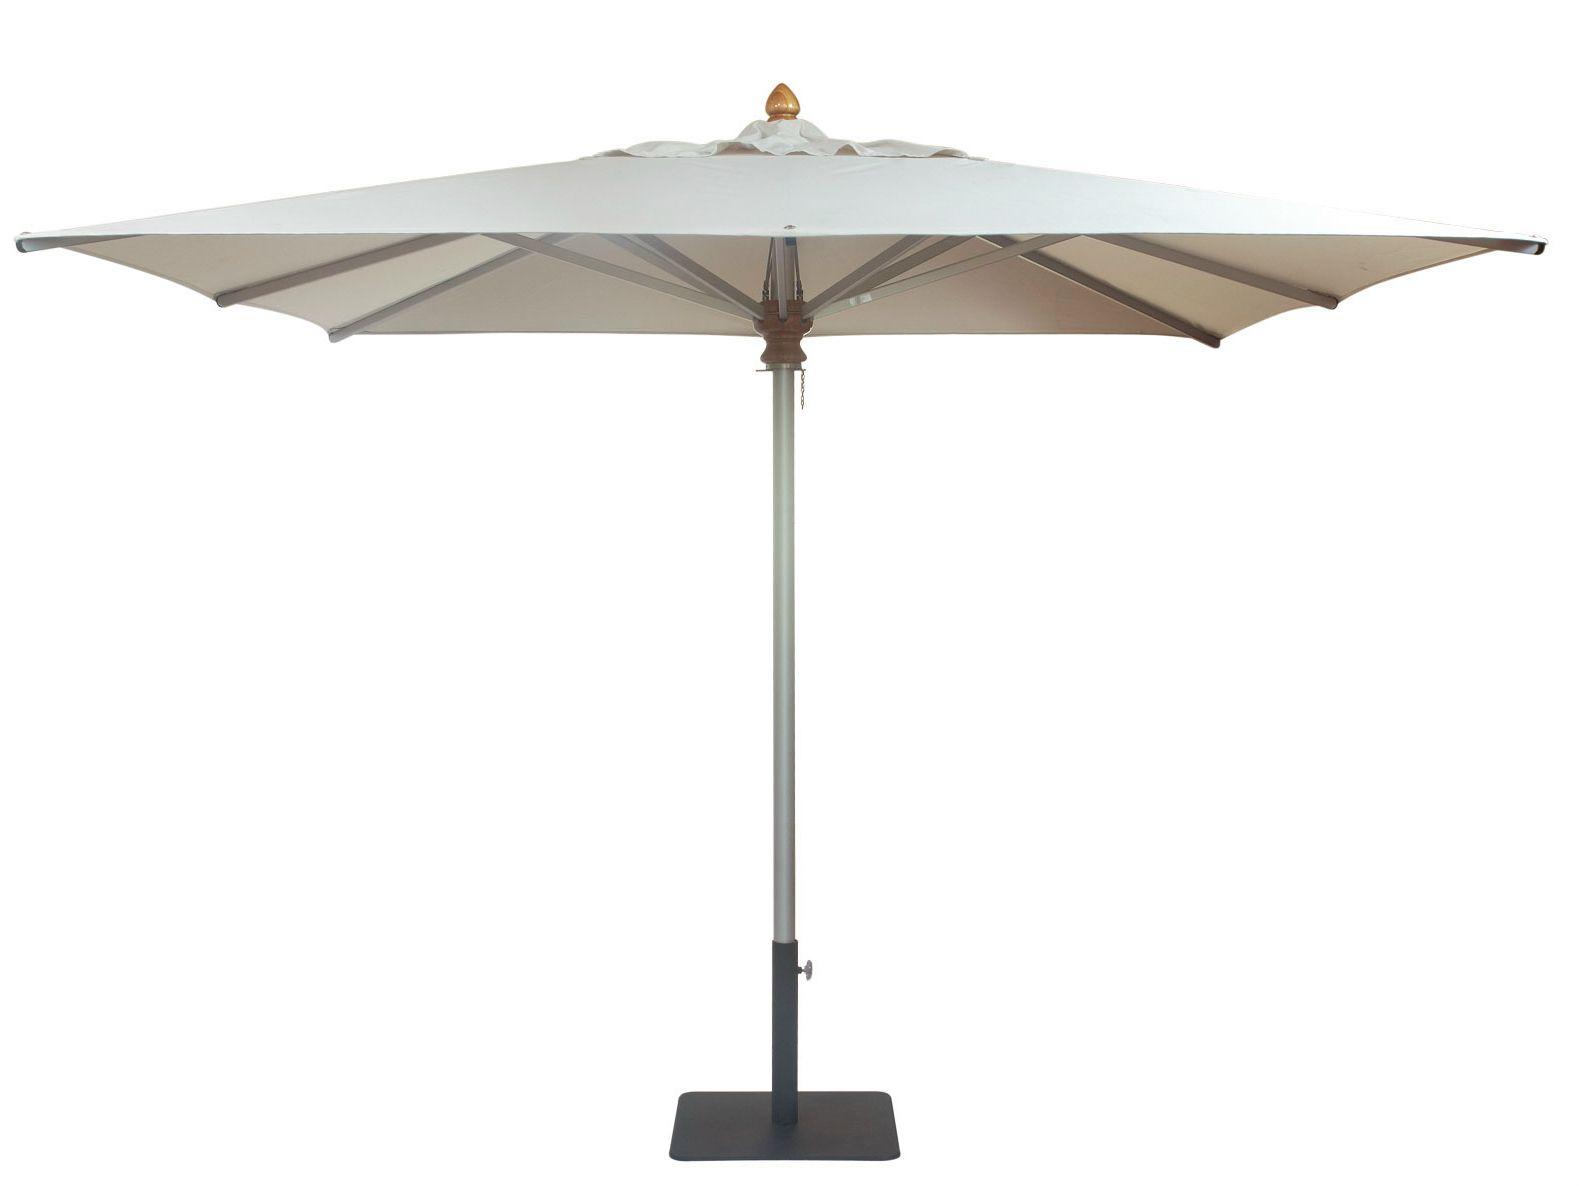 sunbird rectangular garden umbrella by tectona. Black Bedroom Furniture Sets. Home Design Ideas